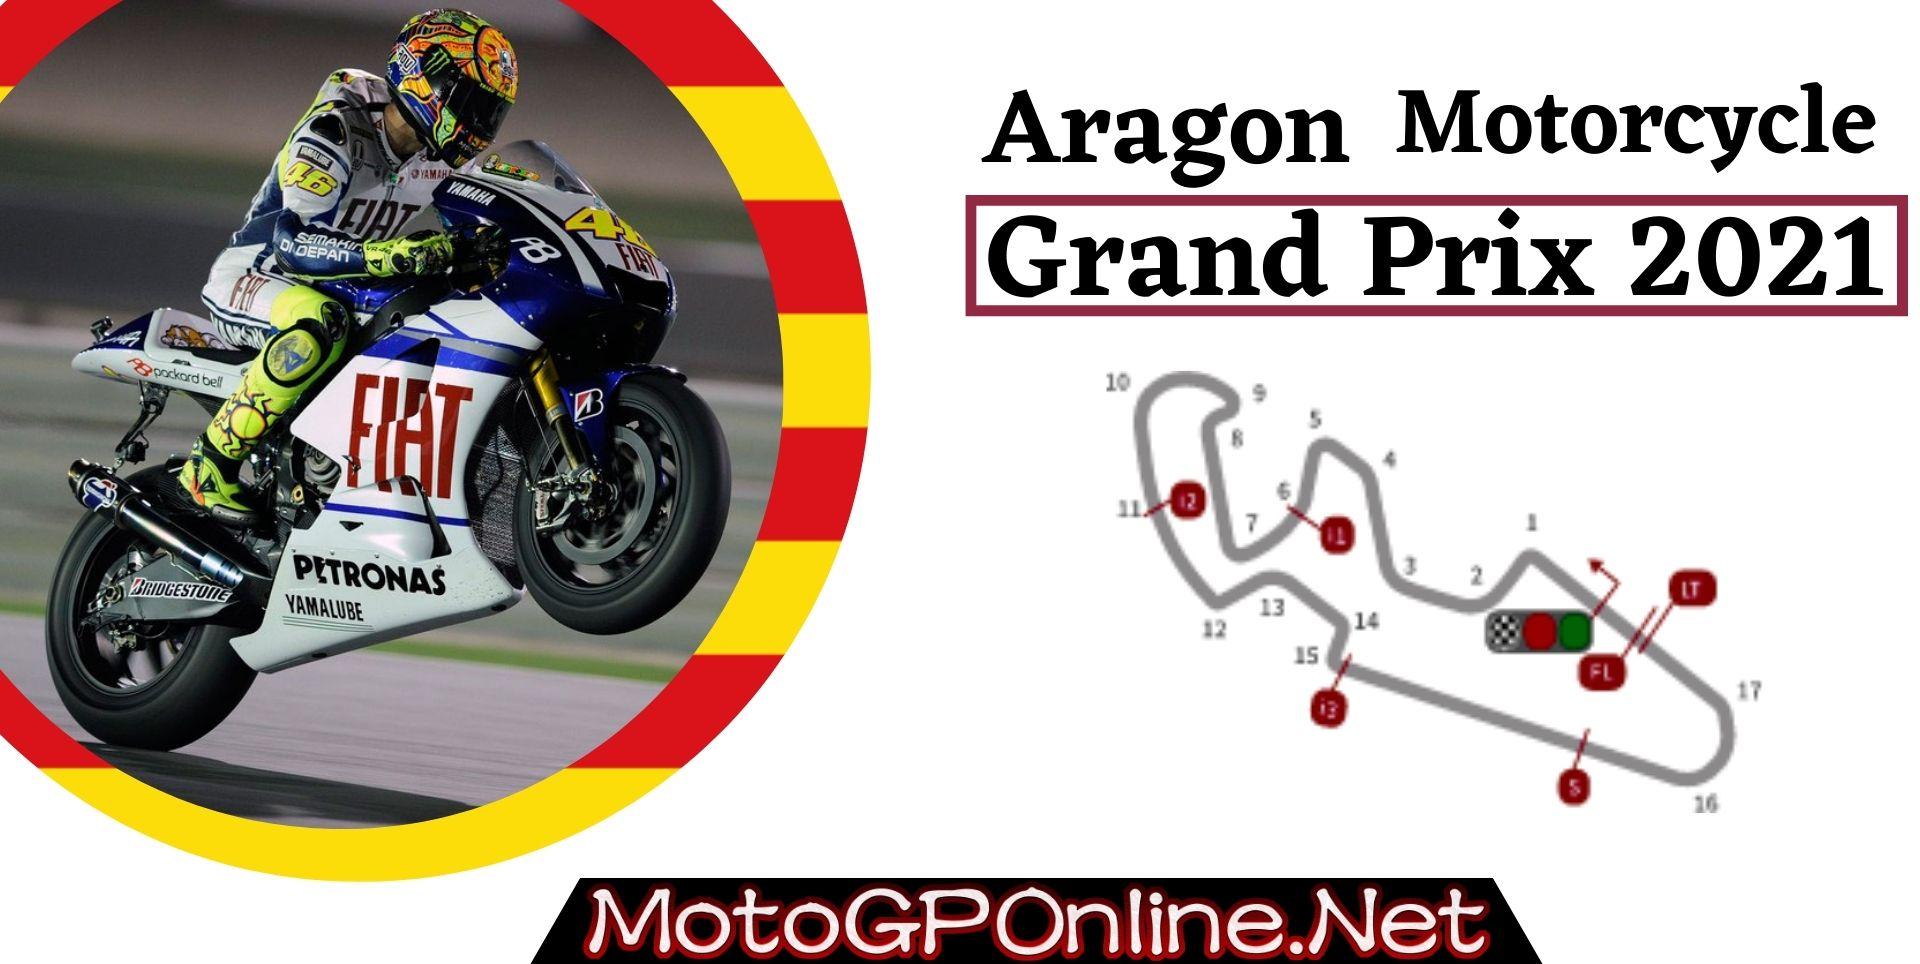 Aragon Grand Prix Live Stream MotoGP 2021 | Full Race Replay